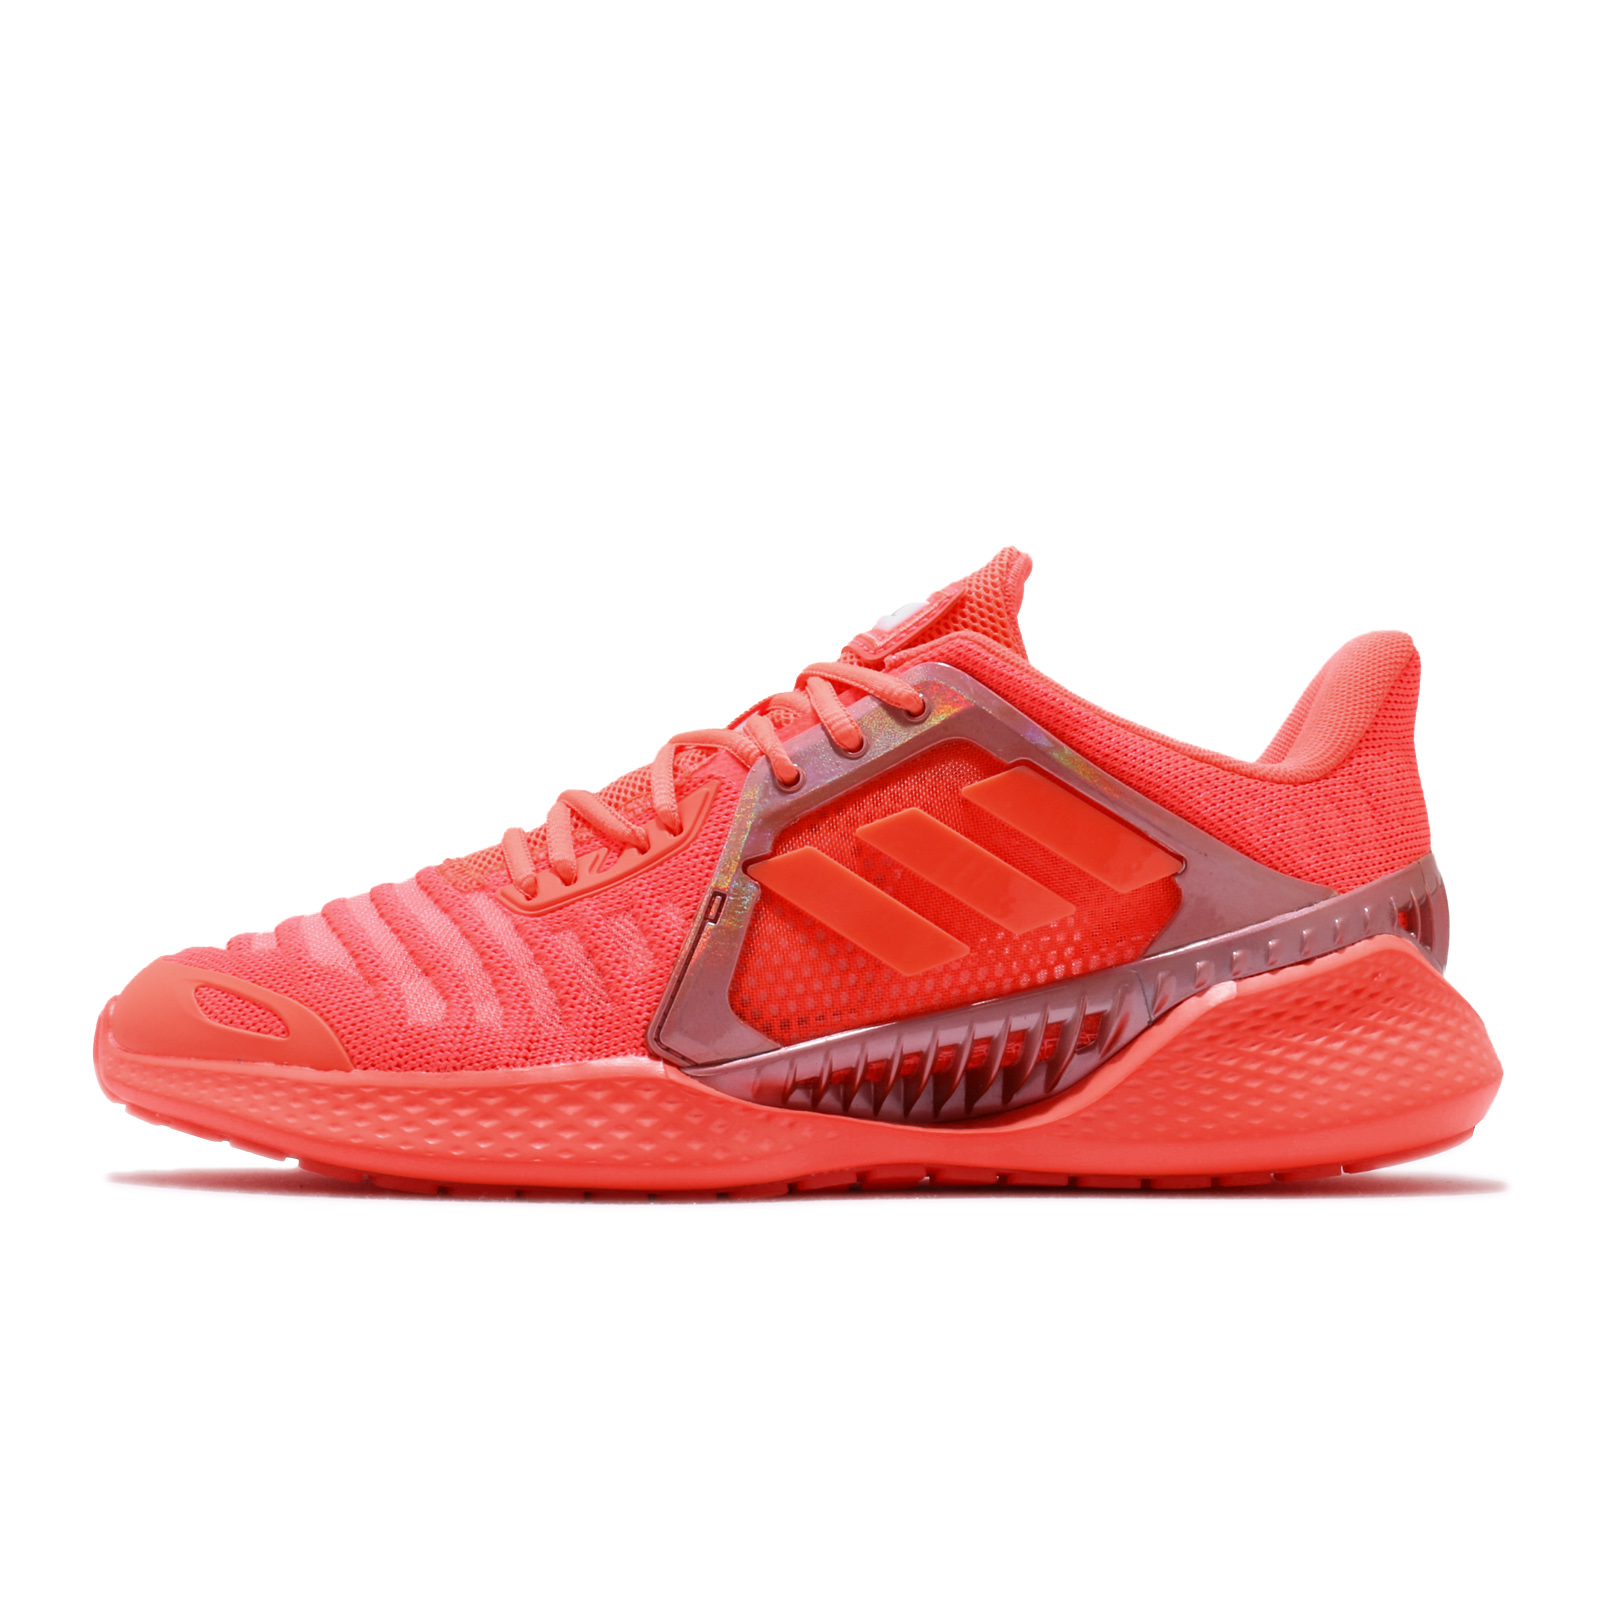 adidas 慢跑鞋 ClimaCool Vent Summer.Rdy 橘紅 透氣 男鞋【ACS】 EE4639